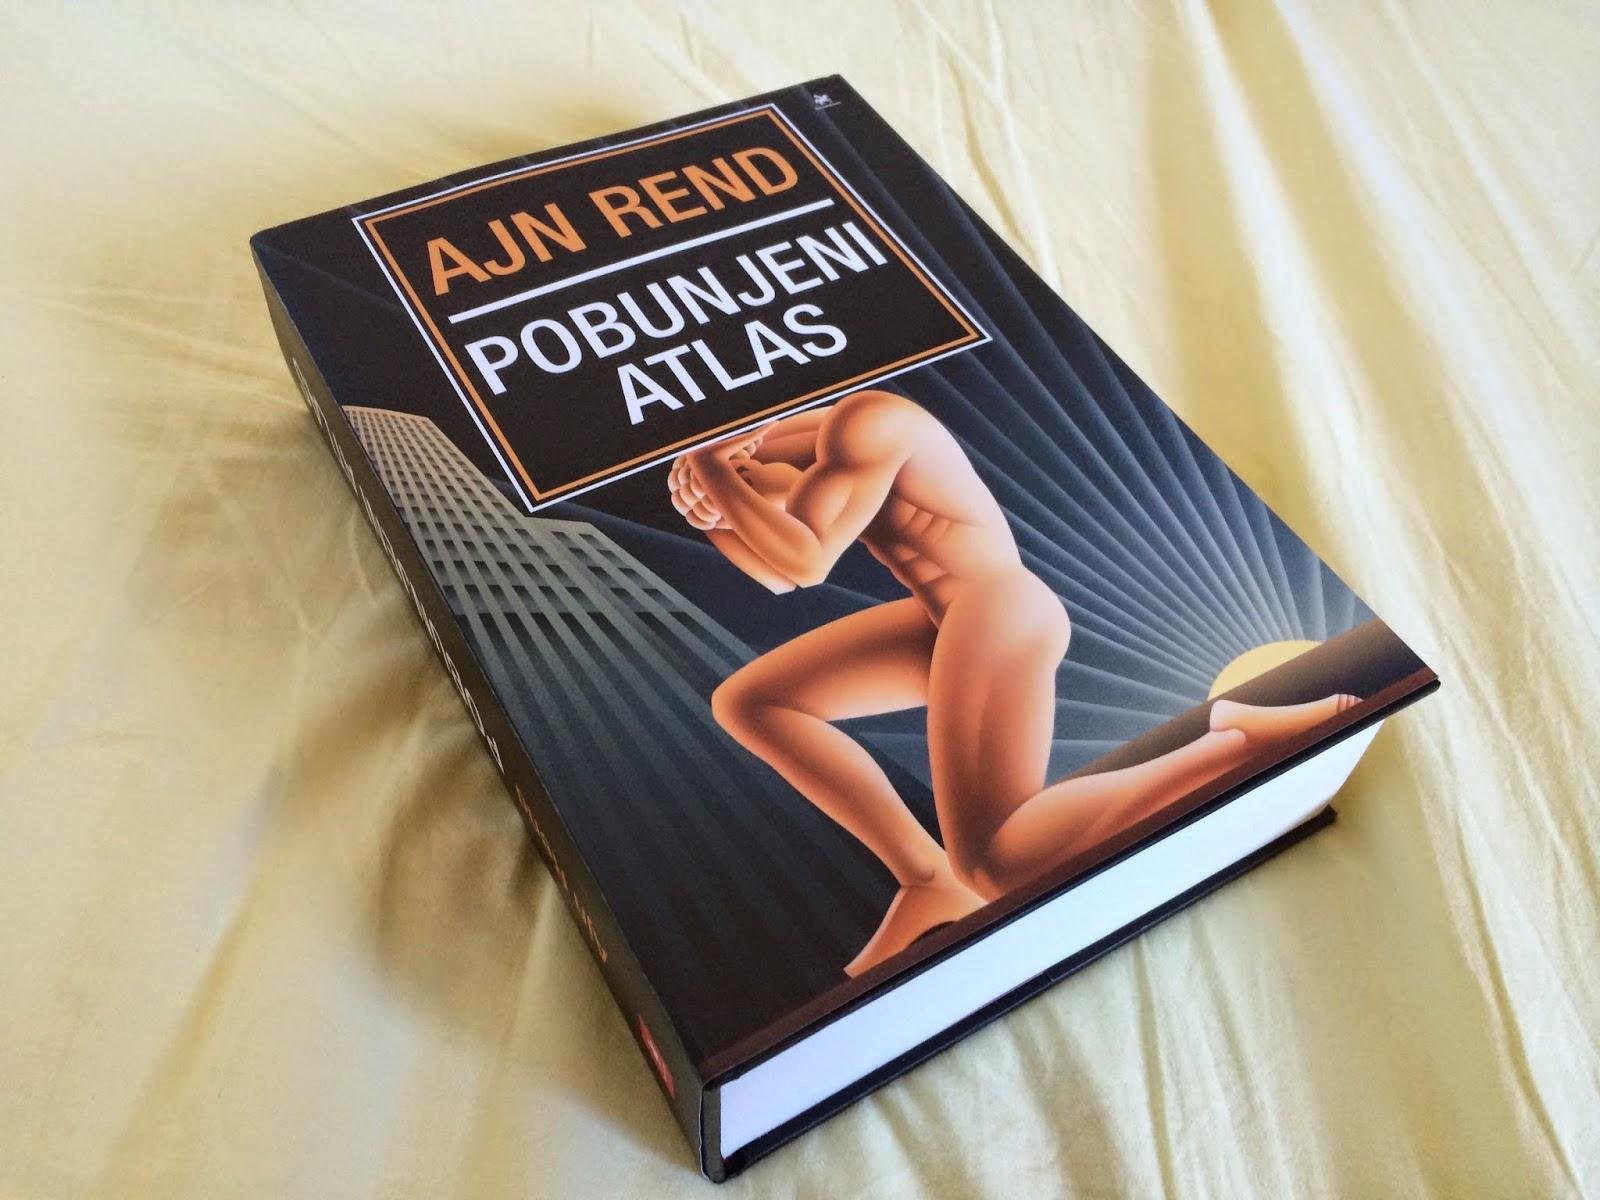 Bookviewers: Atlas Shrugged / Pobunjeni Atlas, Ayn Rand